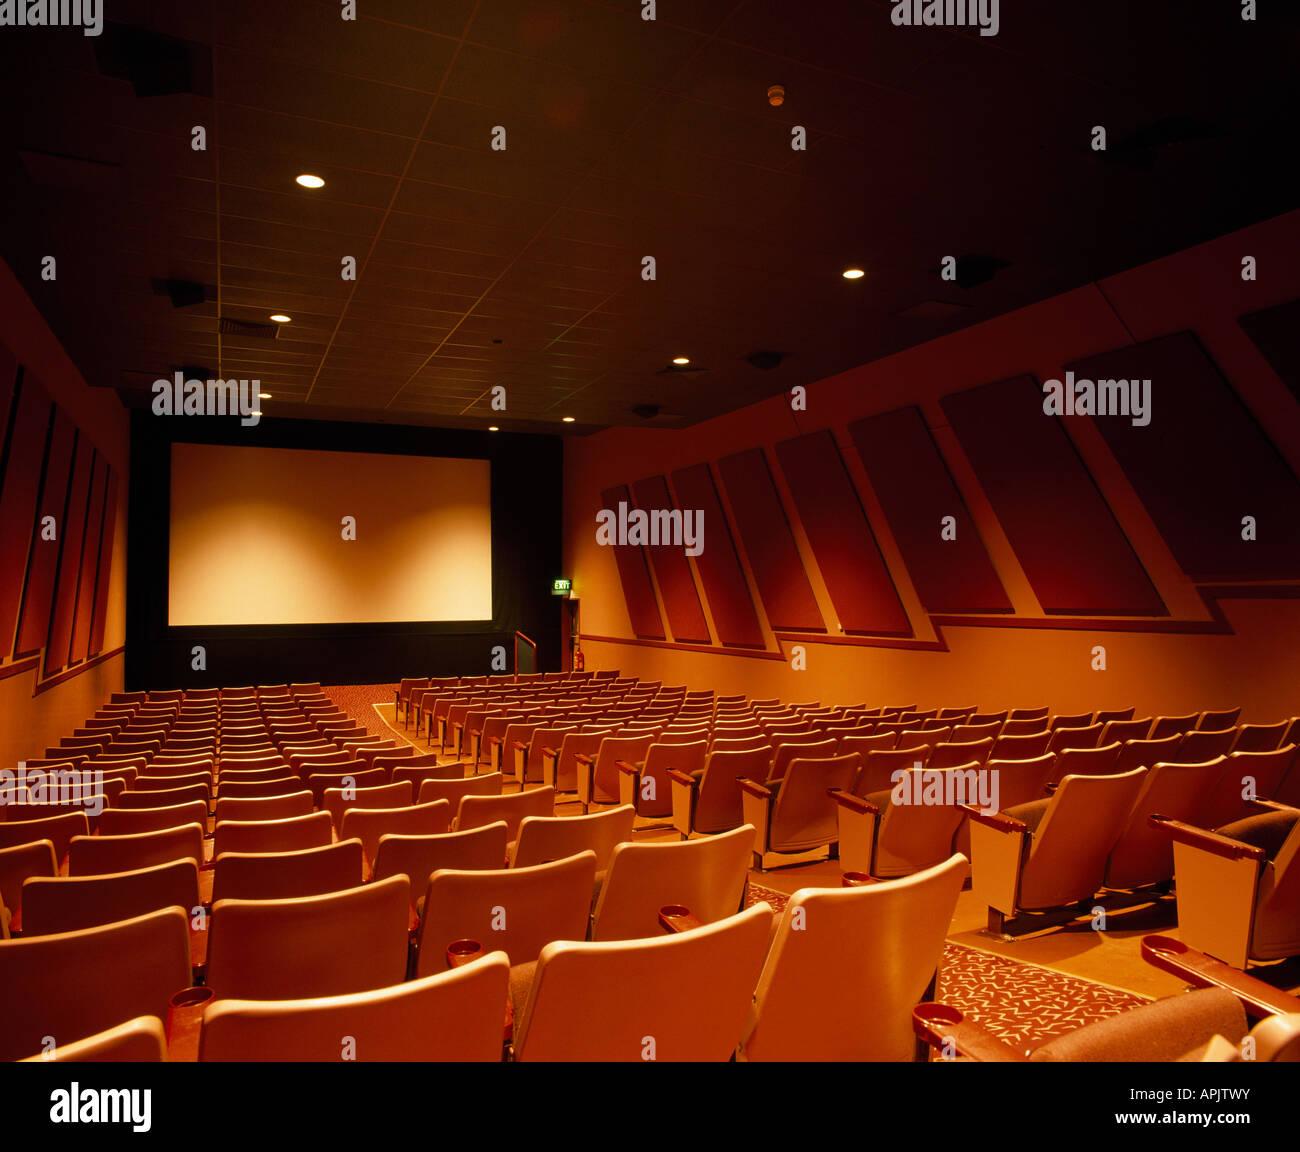 Cinema - Stock Image